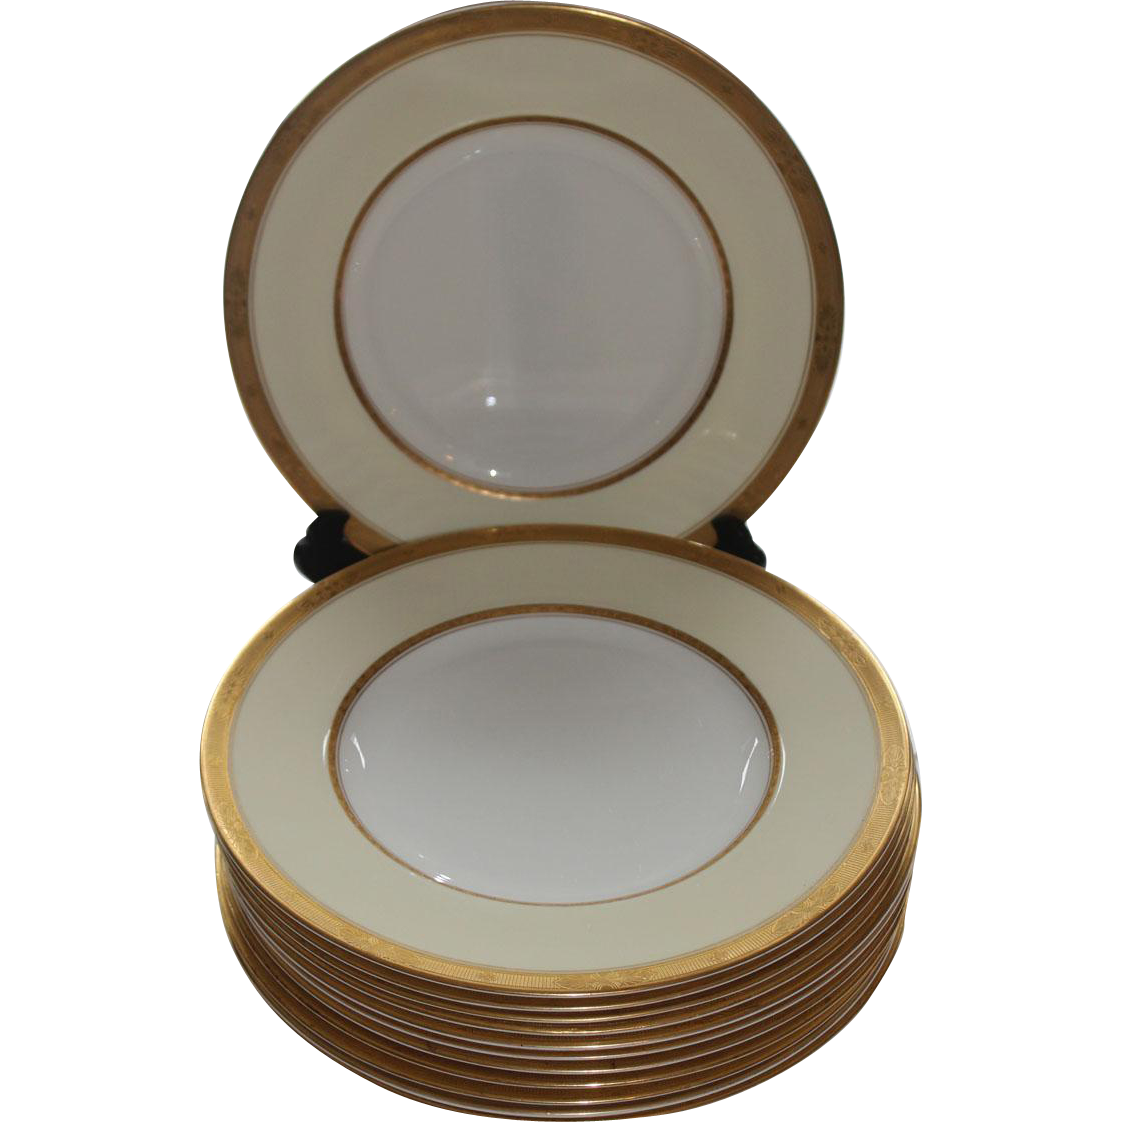 12 Royal Worcester Diana Dinner Plates Burley & Co. Chicago Rubylane.com